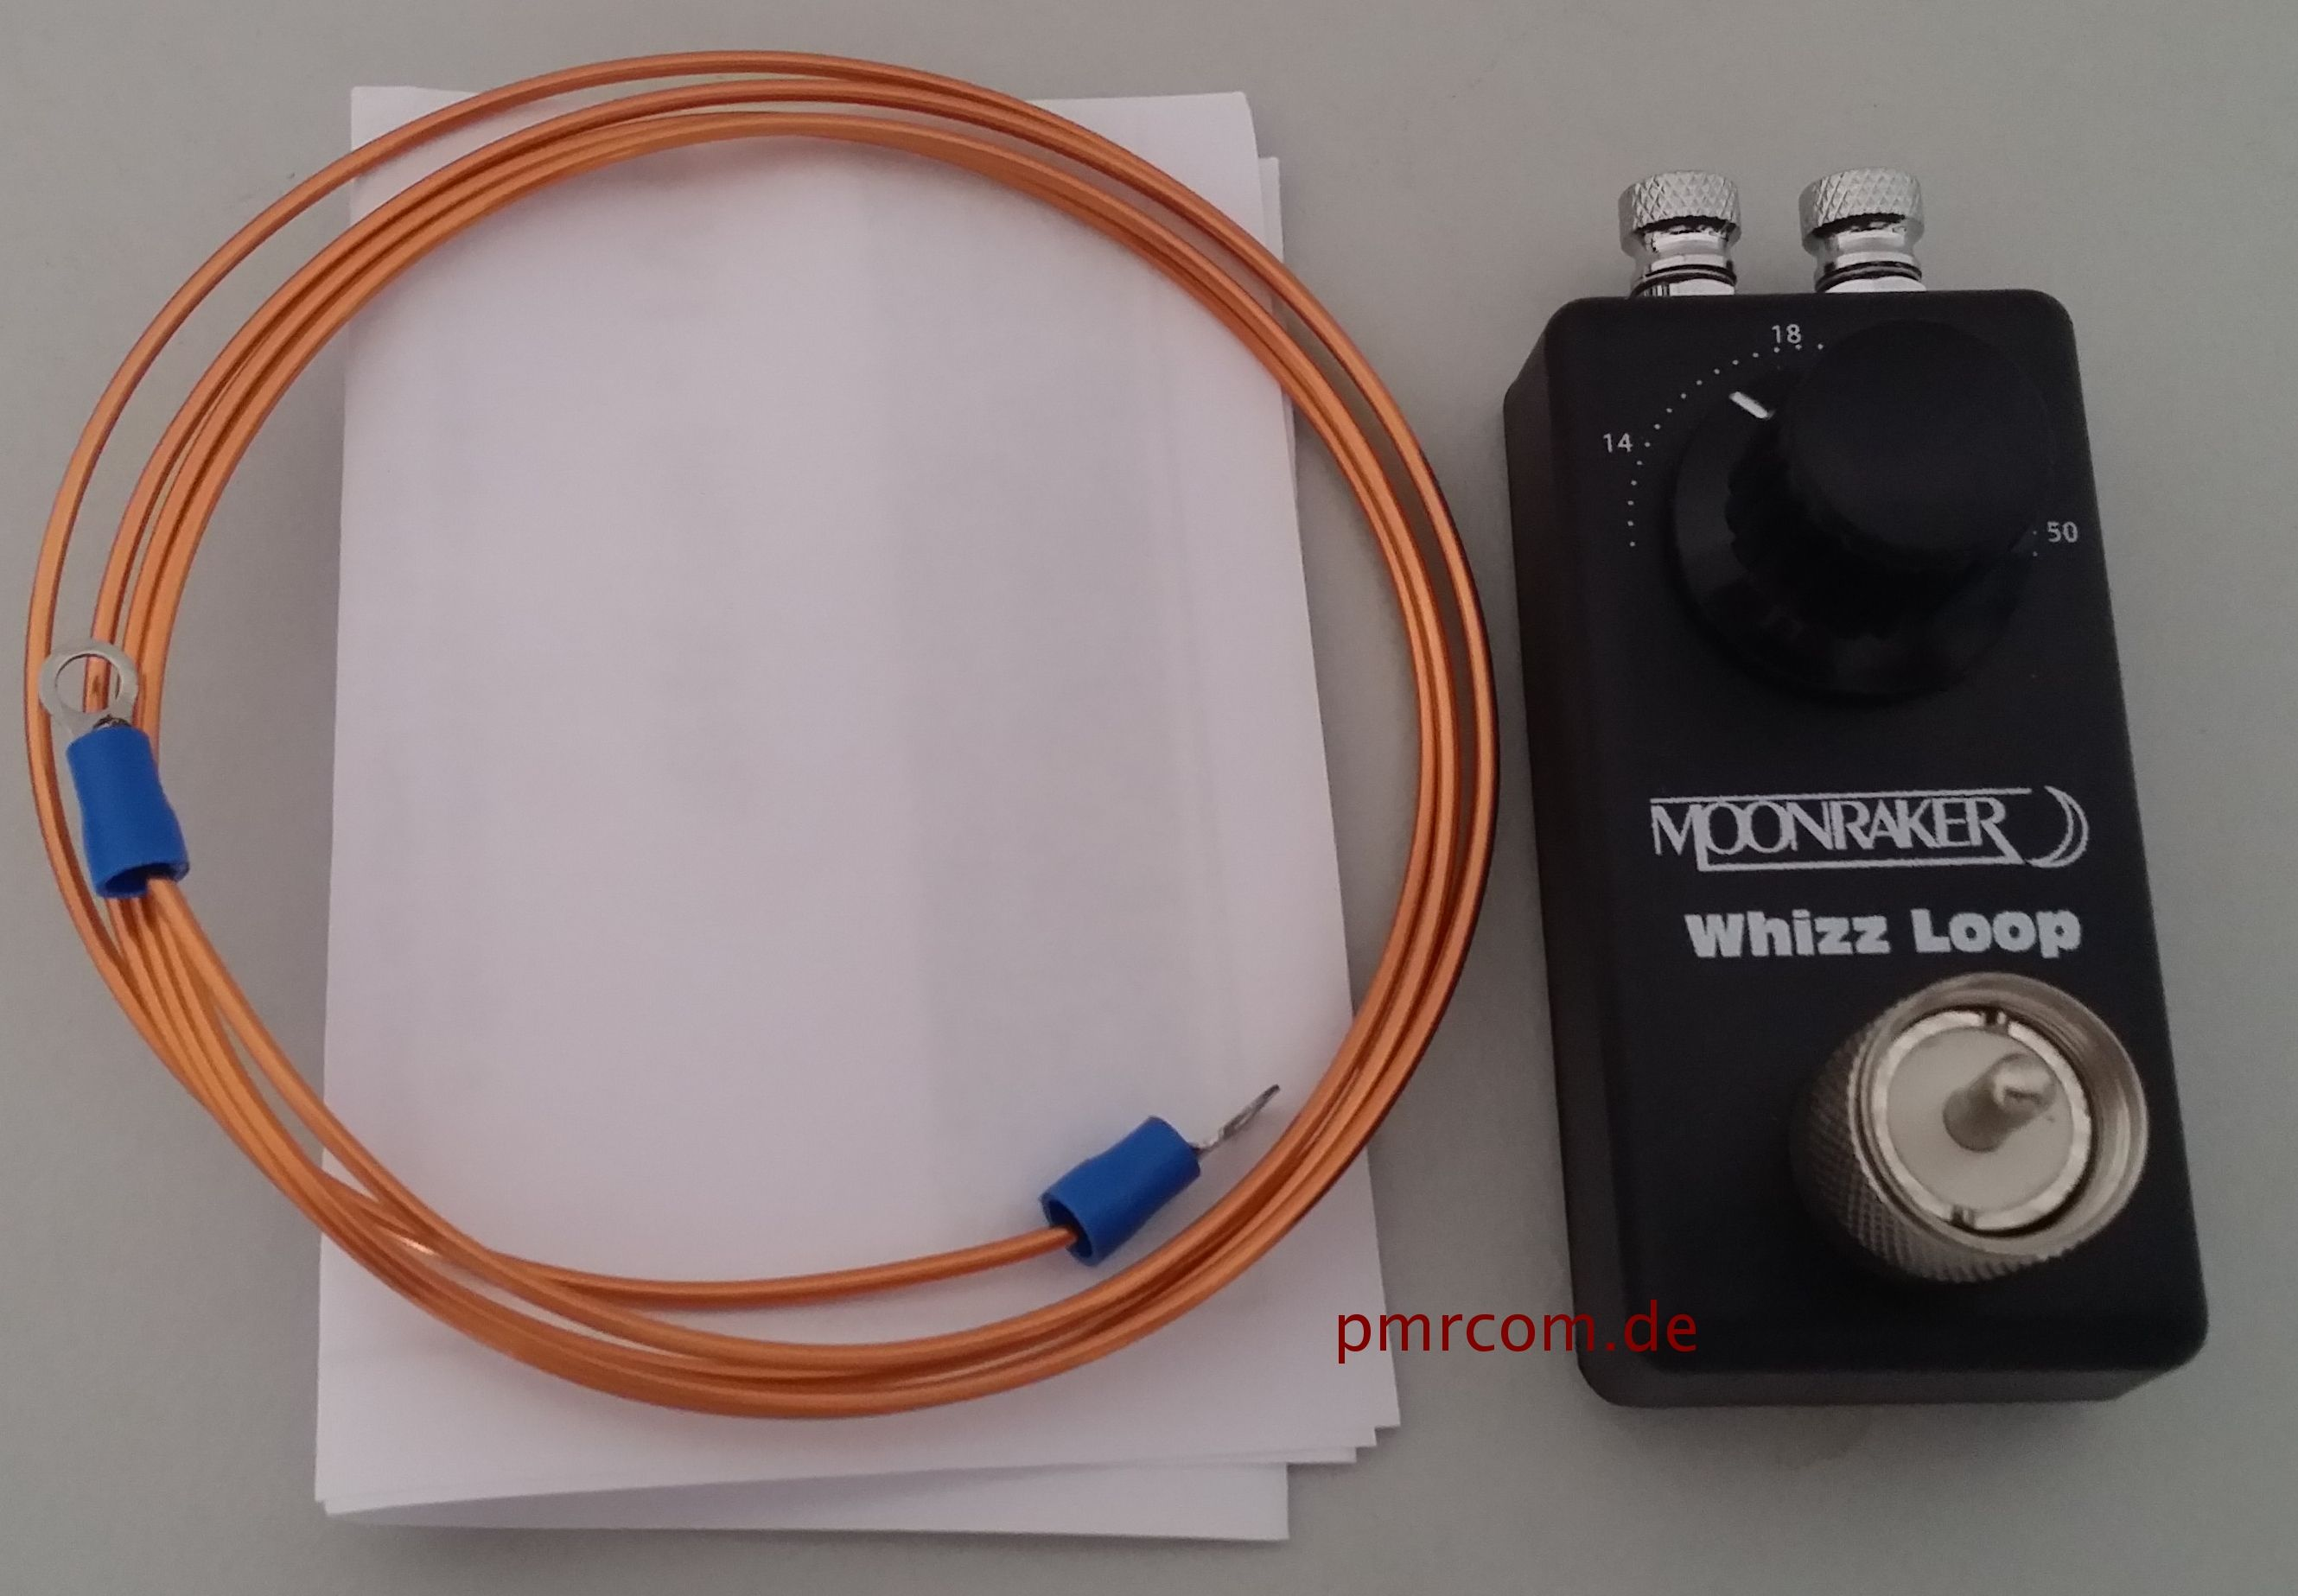 Moonraker Whizz Loop Qrp Antenne 20m Bis 6m Band Antenne